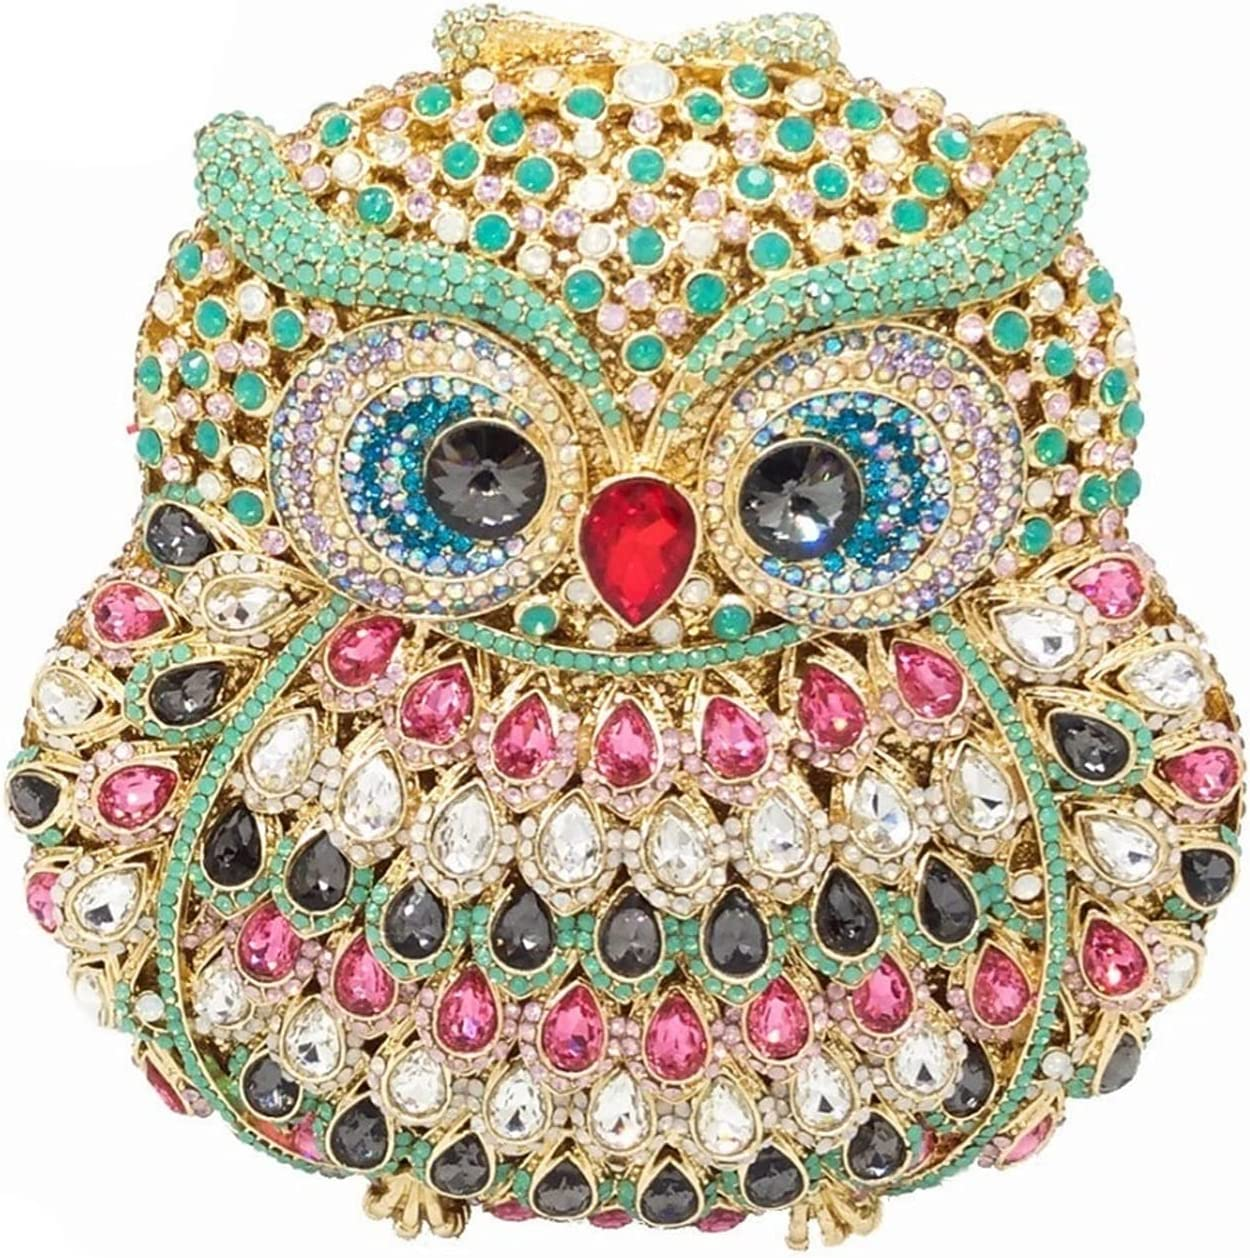 A+TTXH+L Evening Bag Owl Women Diamond Evening Clutch Bag Party Crystals Clutches Wedding Purses Ladies Hollow Out Handbags (Color : A, Size : 1)